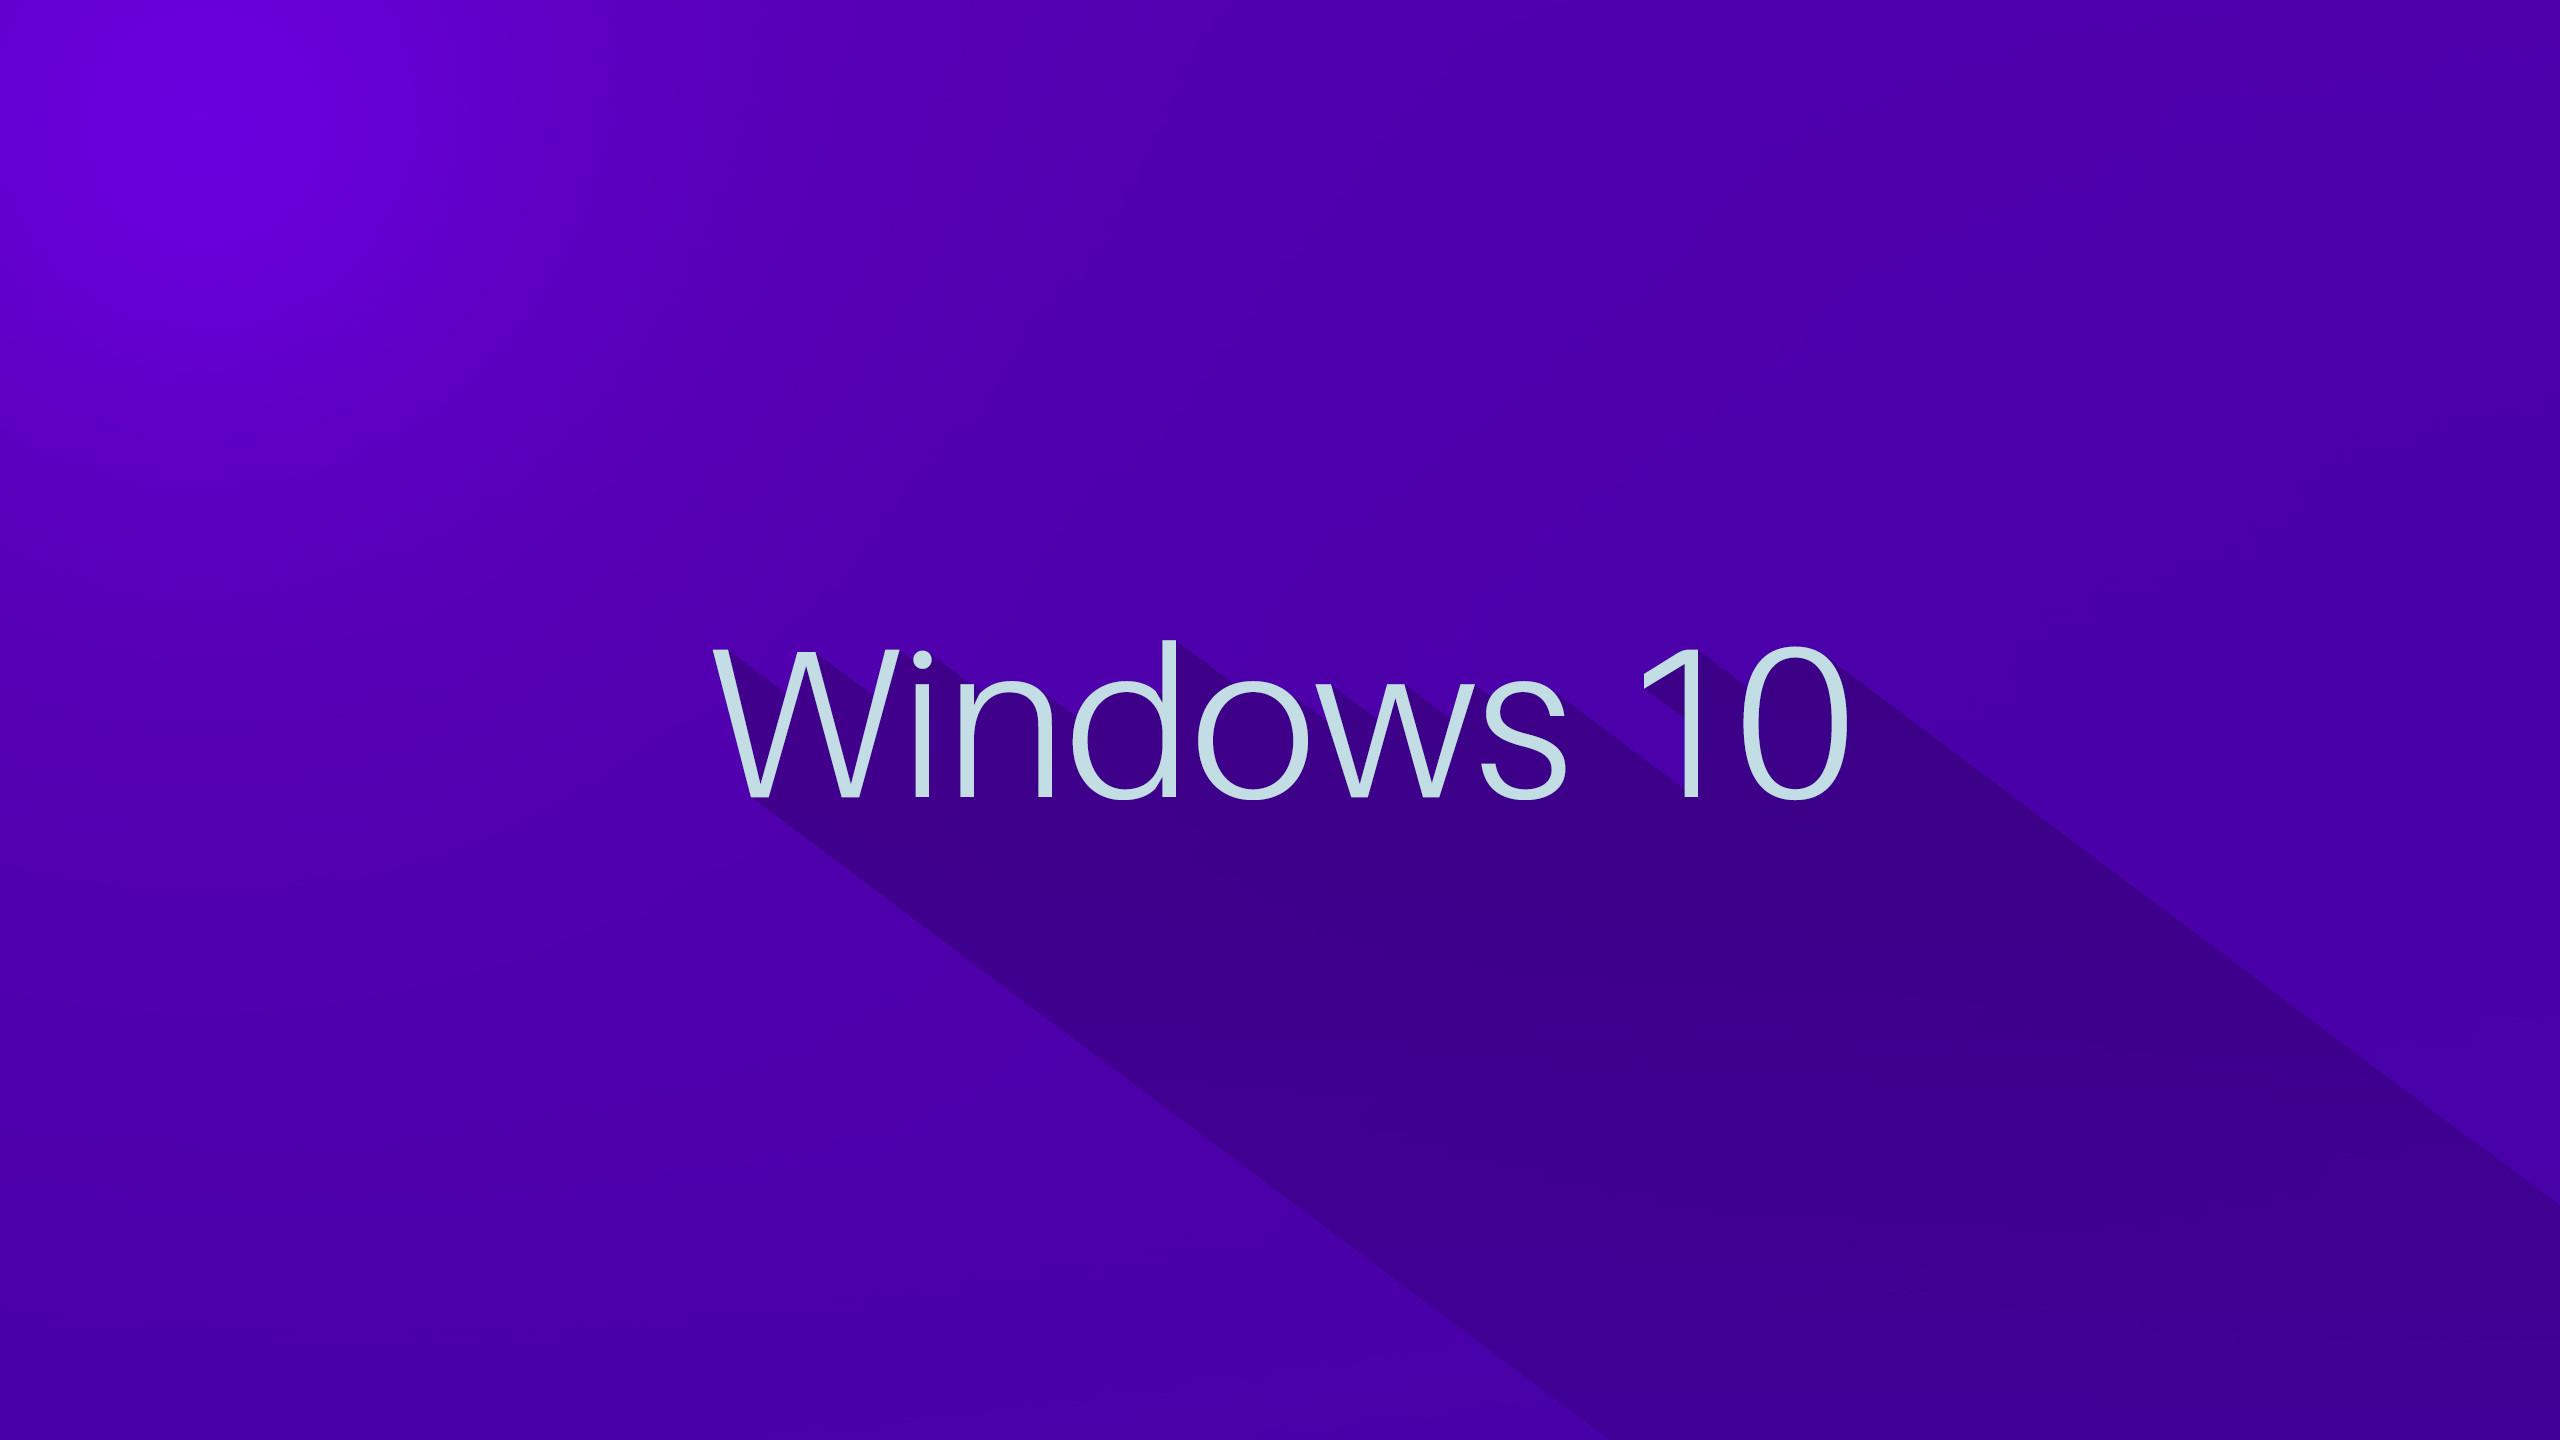 1478172 large windows 10 full hd wallpaper 2560x1440 for htc